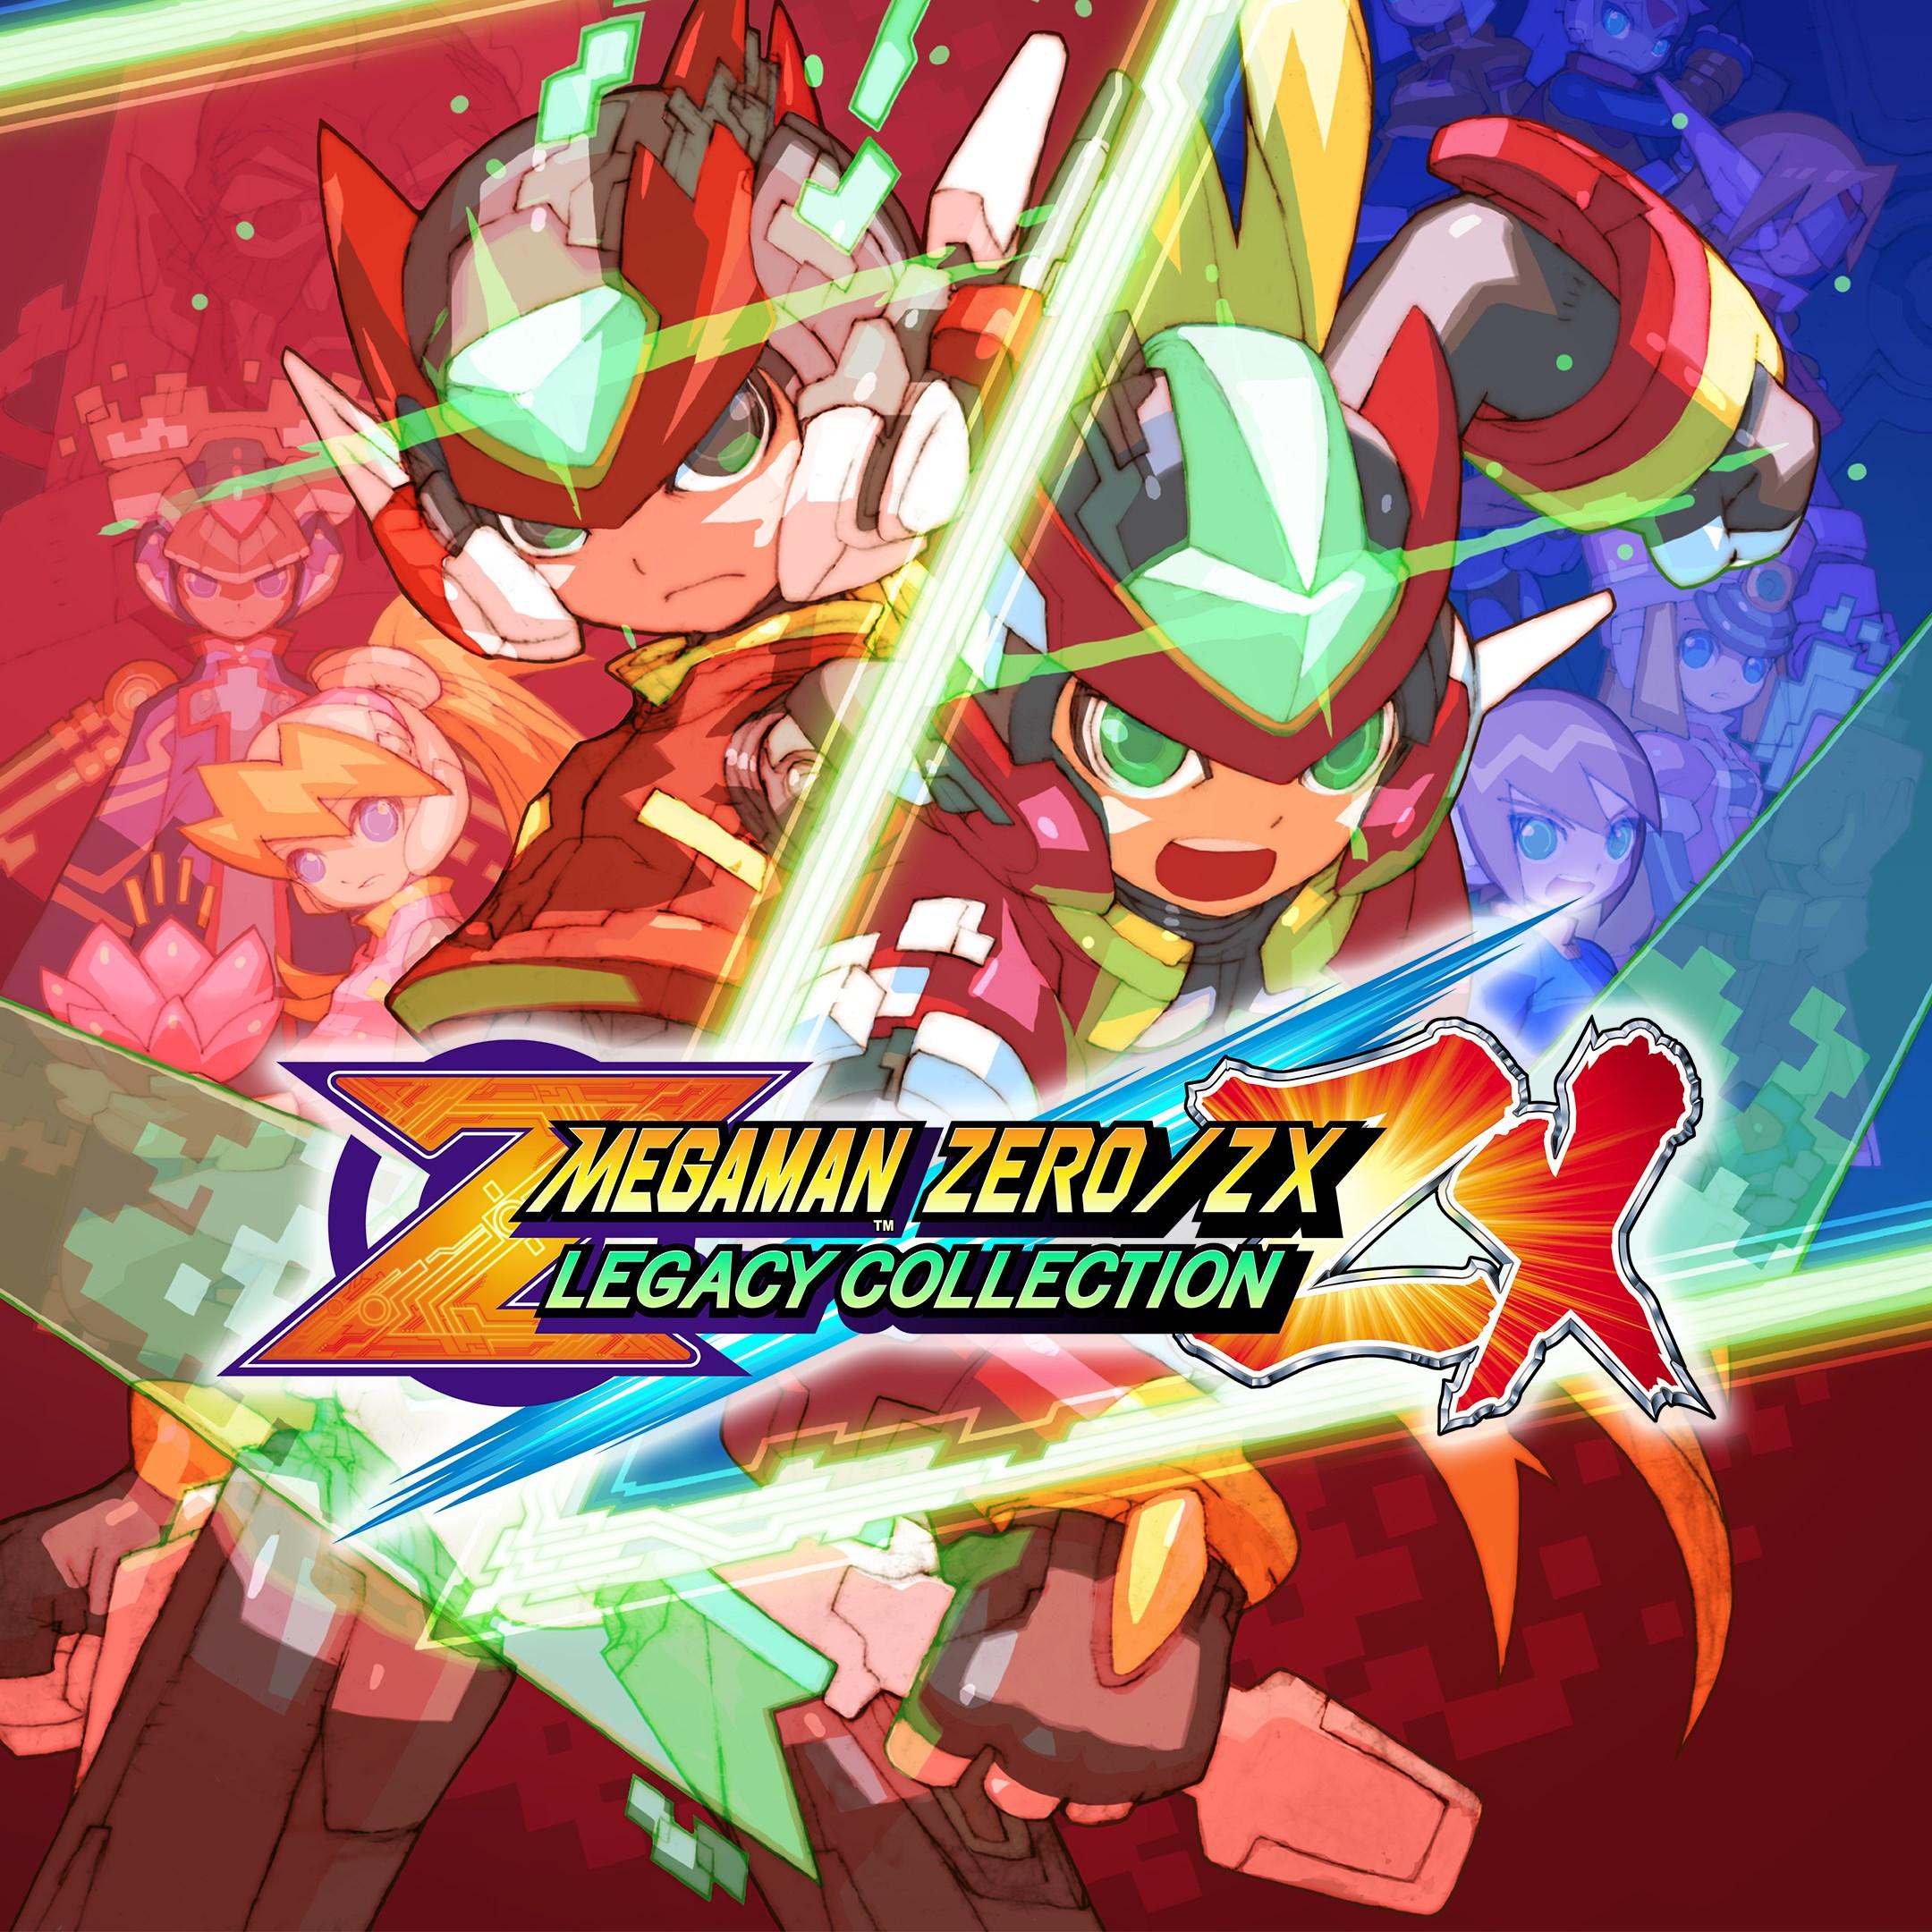 Mega Man Zero/ZX Legacy Collection achievements